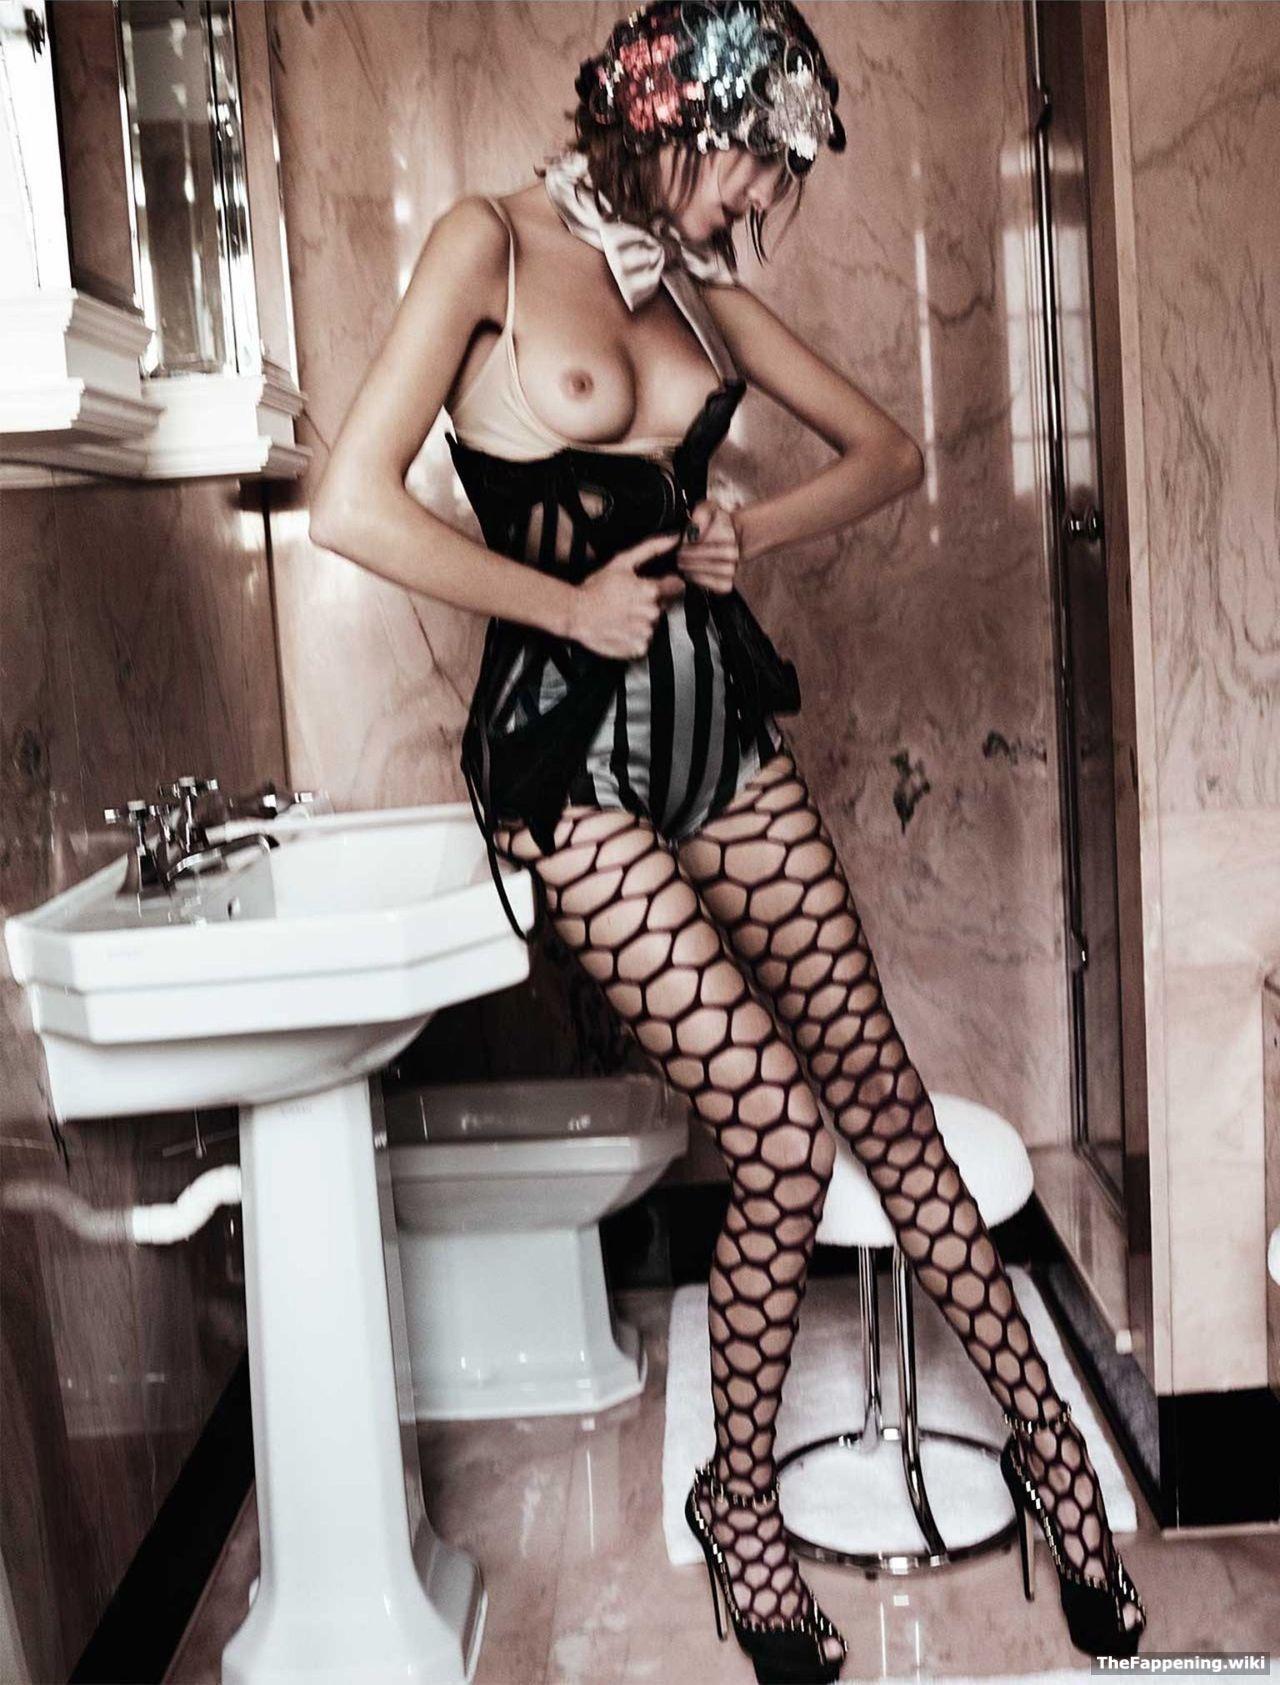 Sex Alexa Chung nude (41 foto and video), Topless, Bikini, Instagram, butt 2020